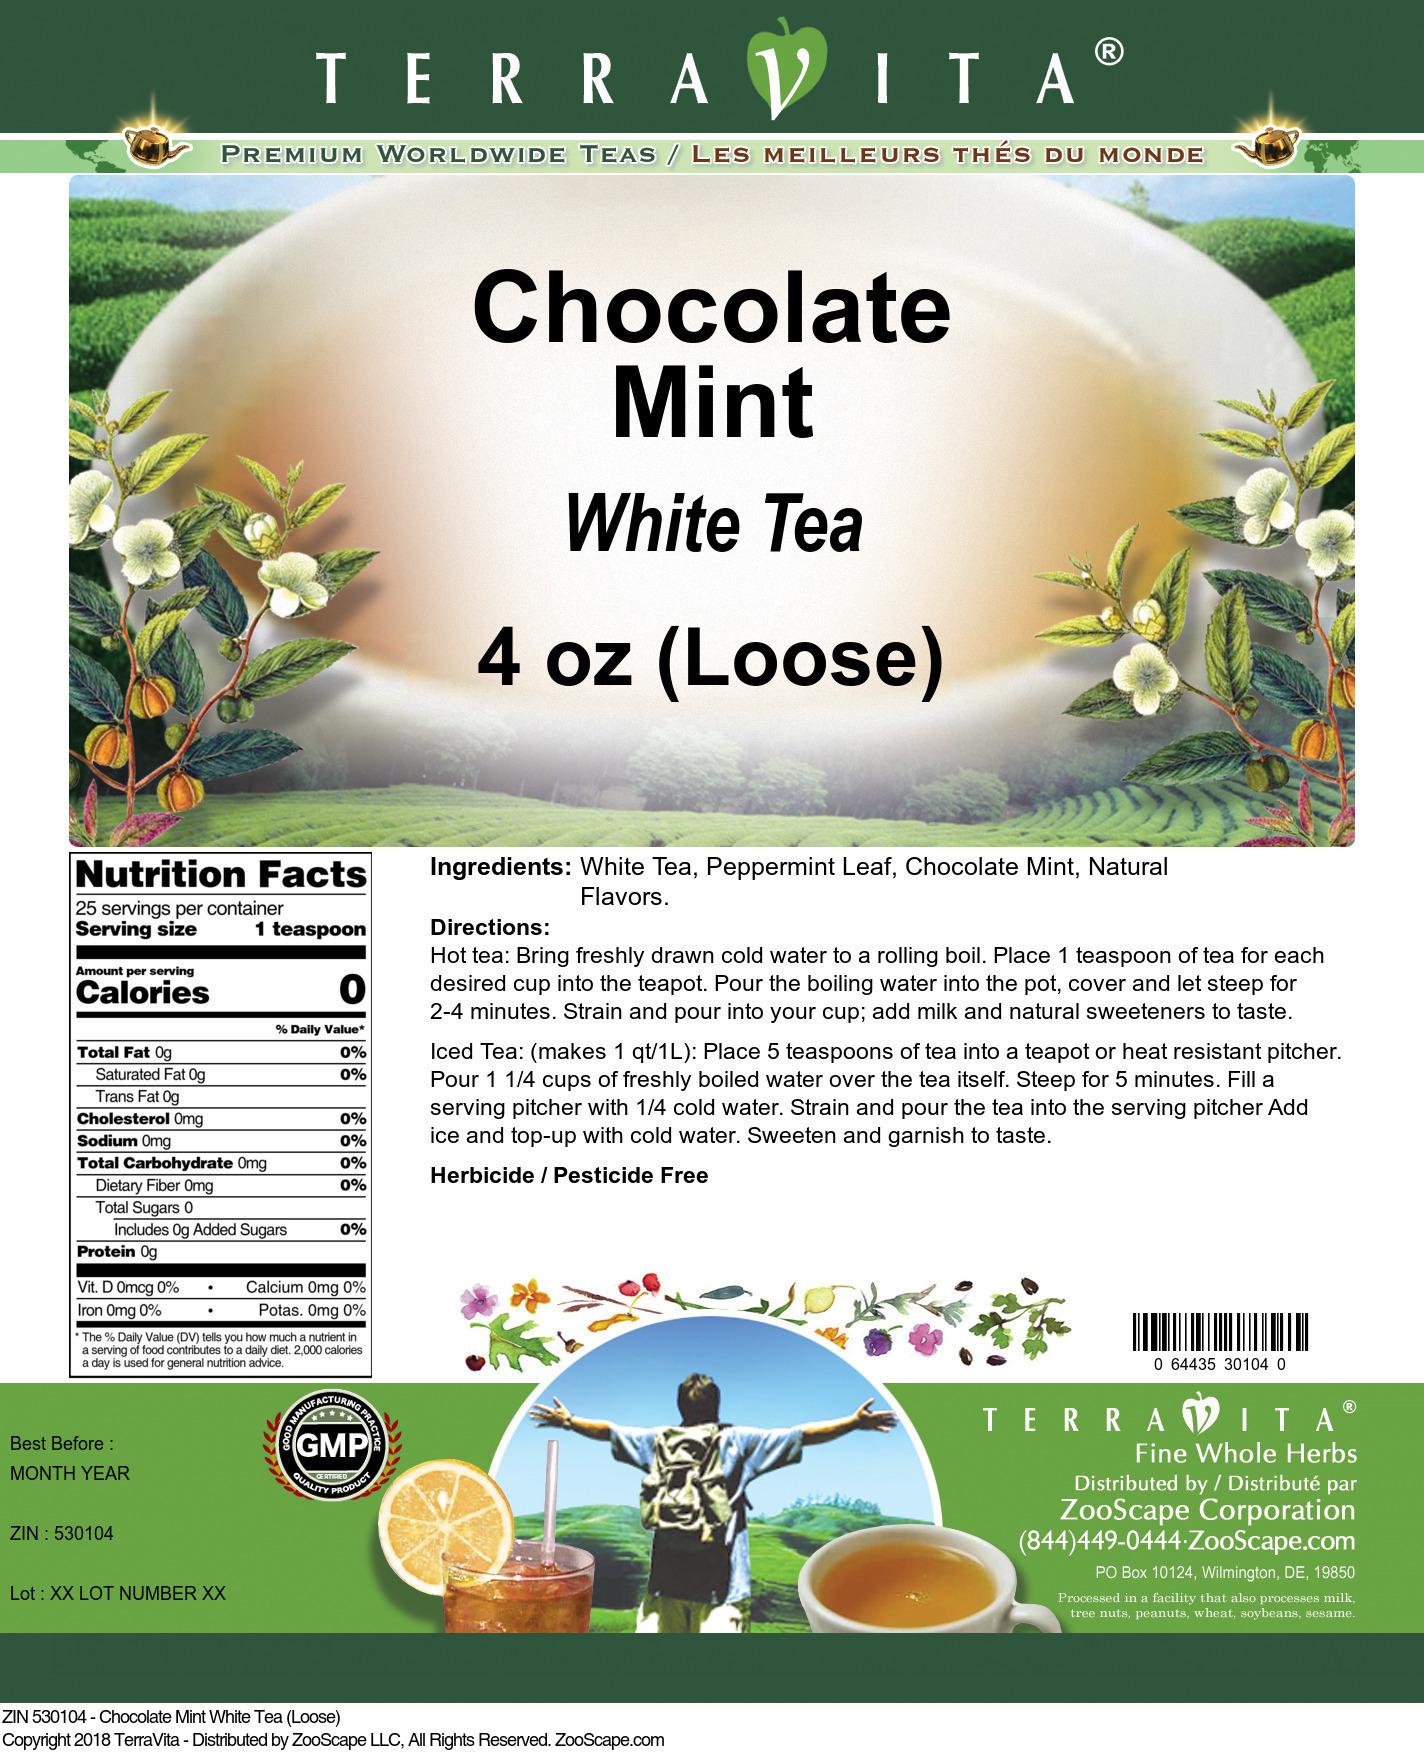 Chocolate Mint White Tea (Loose)